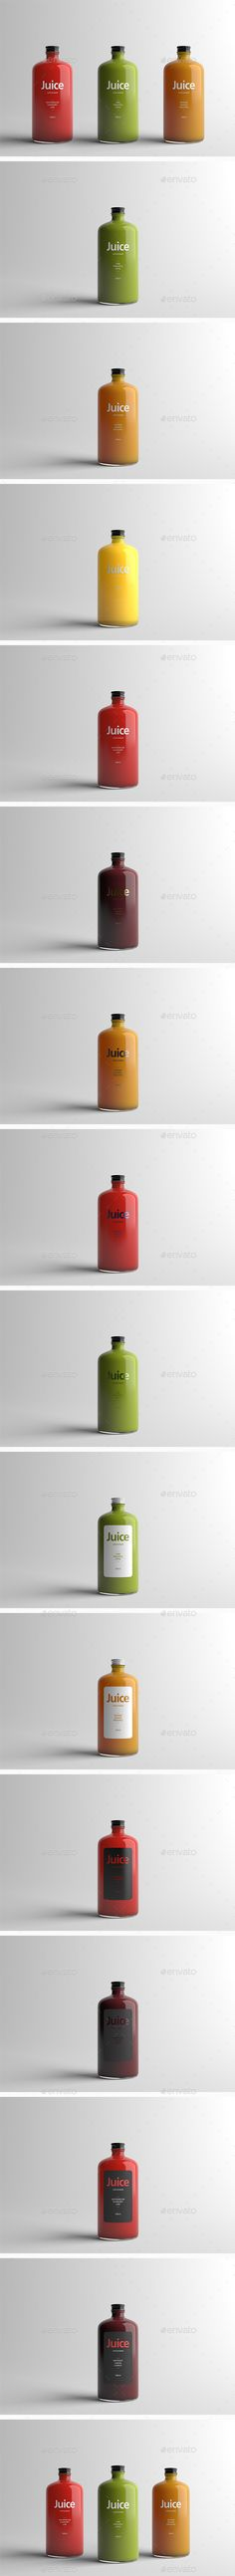 Juice Bottle Packaging Mock-Up. Download here: http://graphicriver.net/item/juice-bottle-packaging-mockup/15336098?ref=ksioks